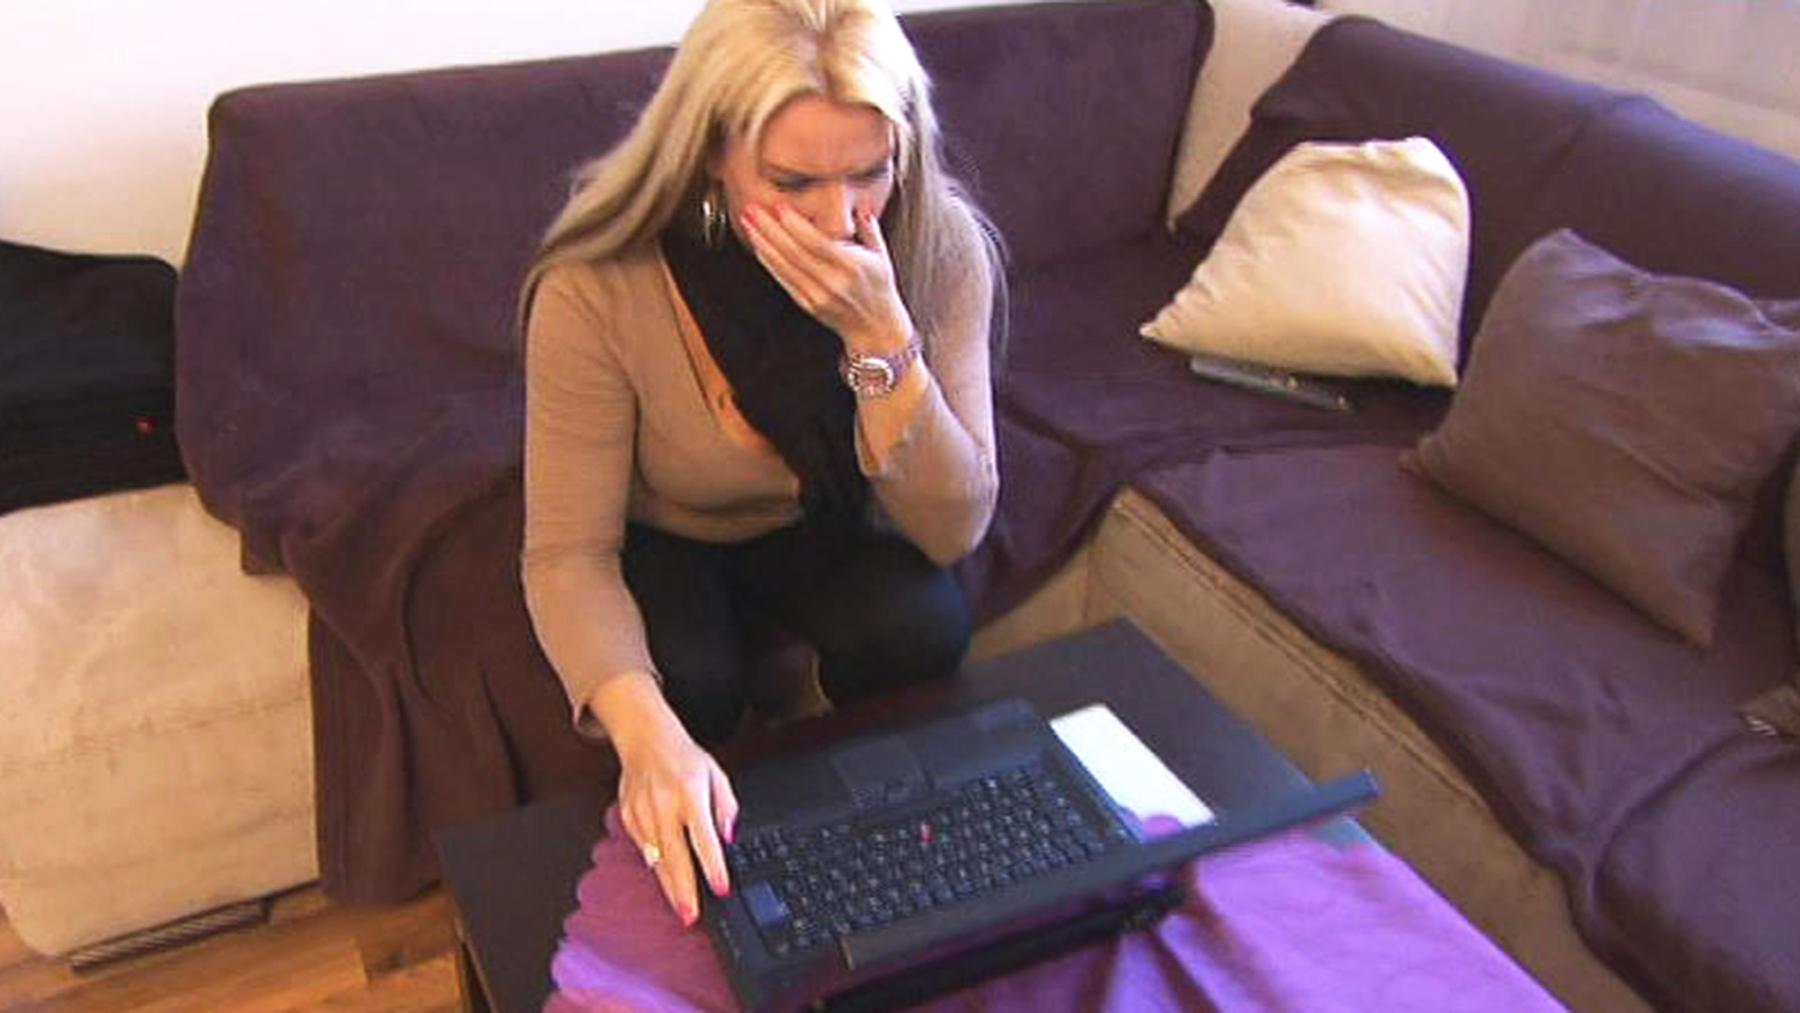 Frau blamiert Familie in Internet-Forum